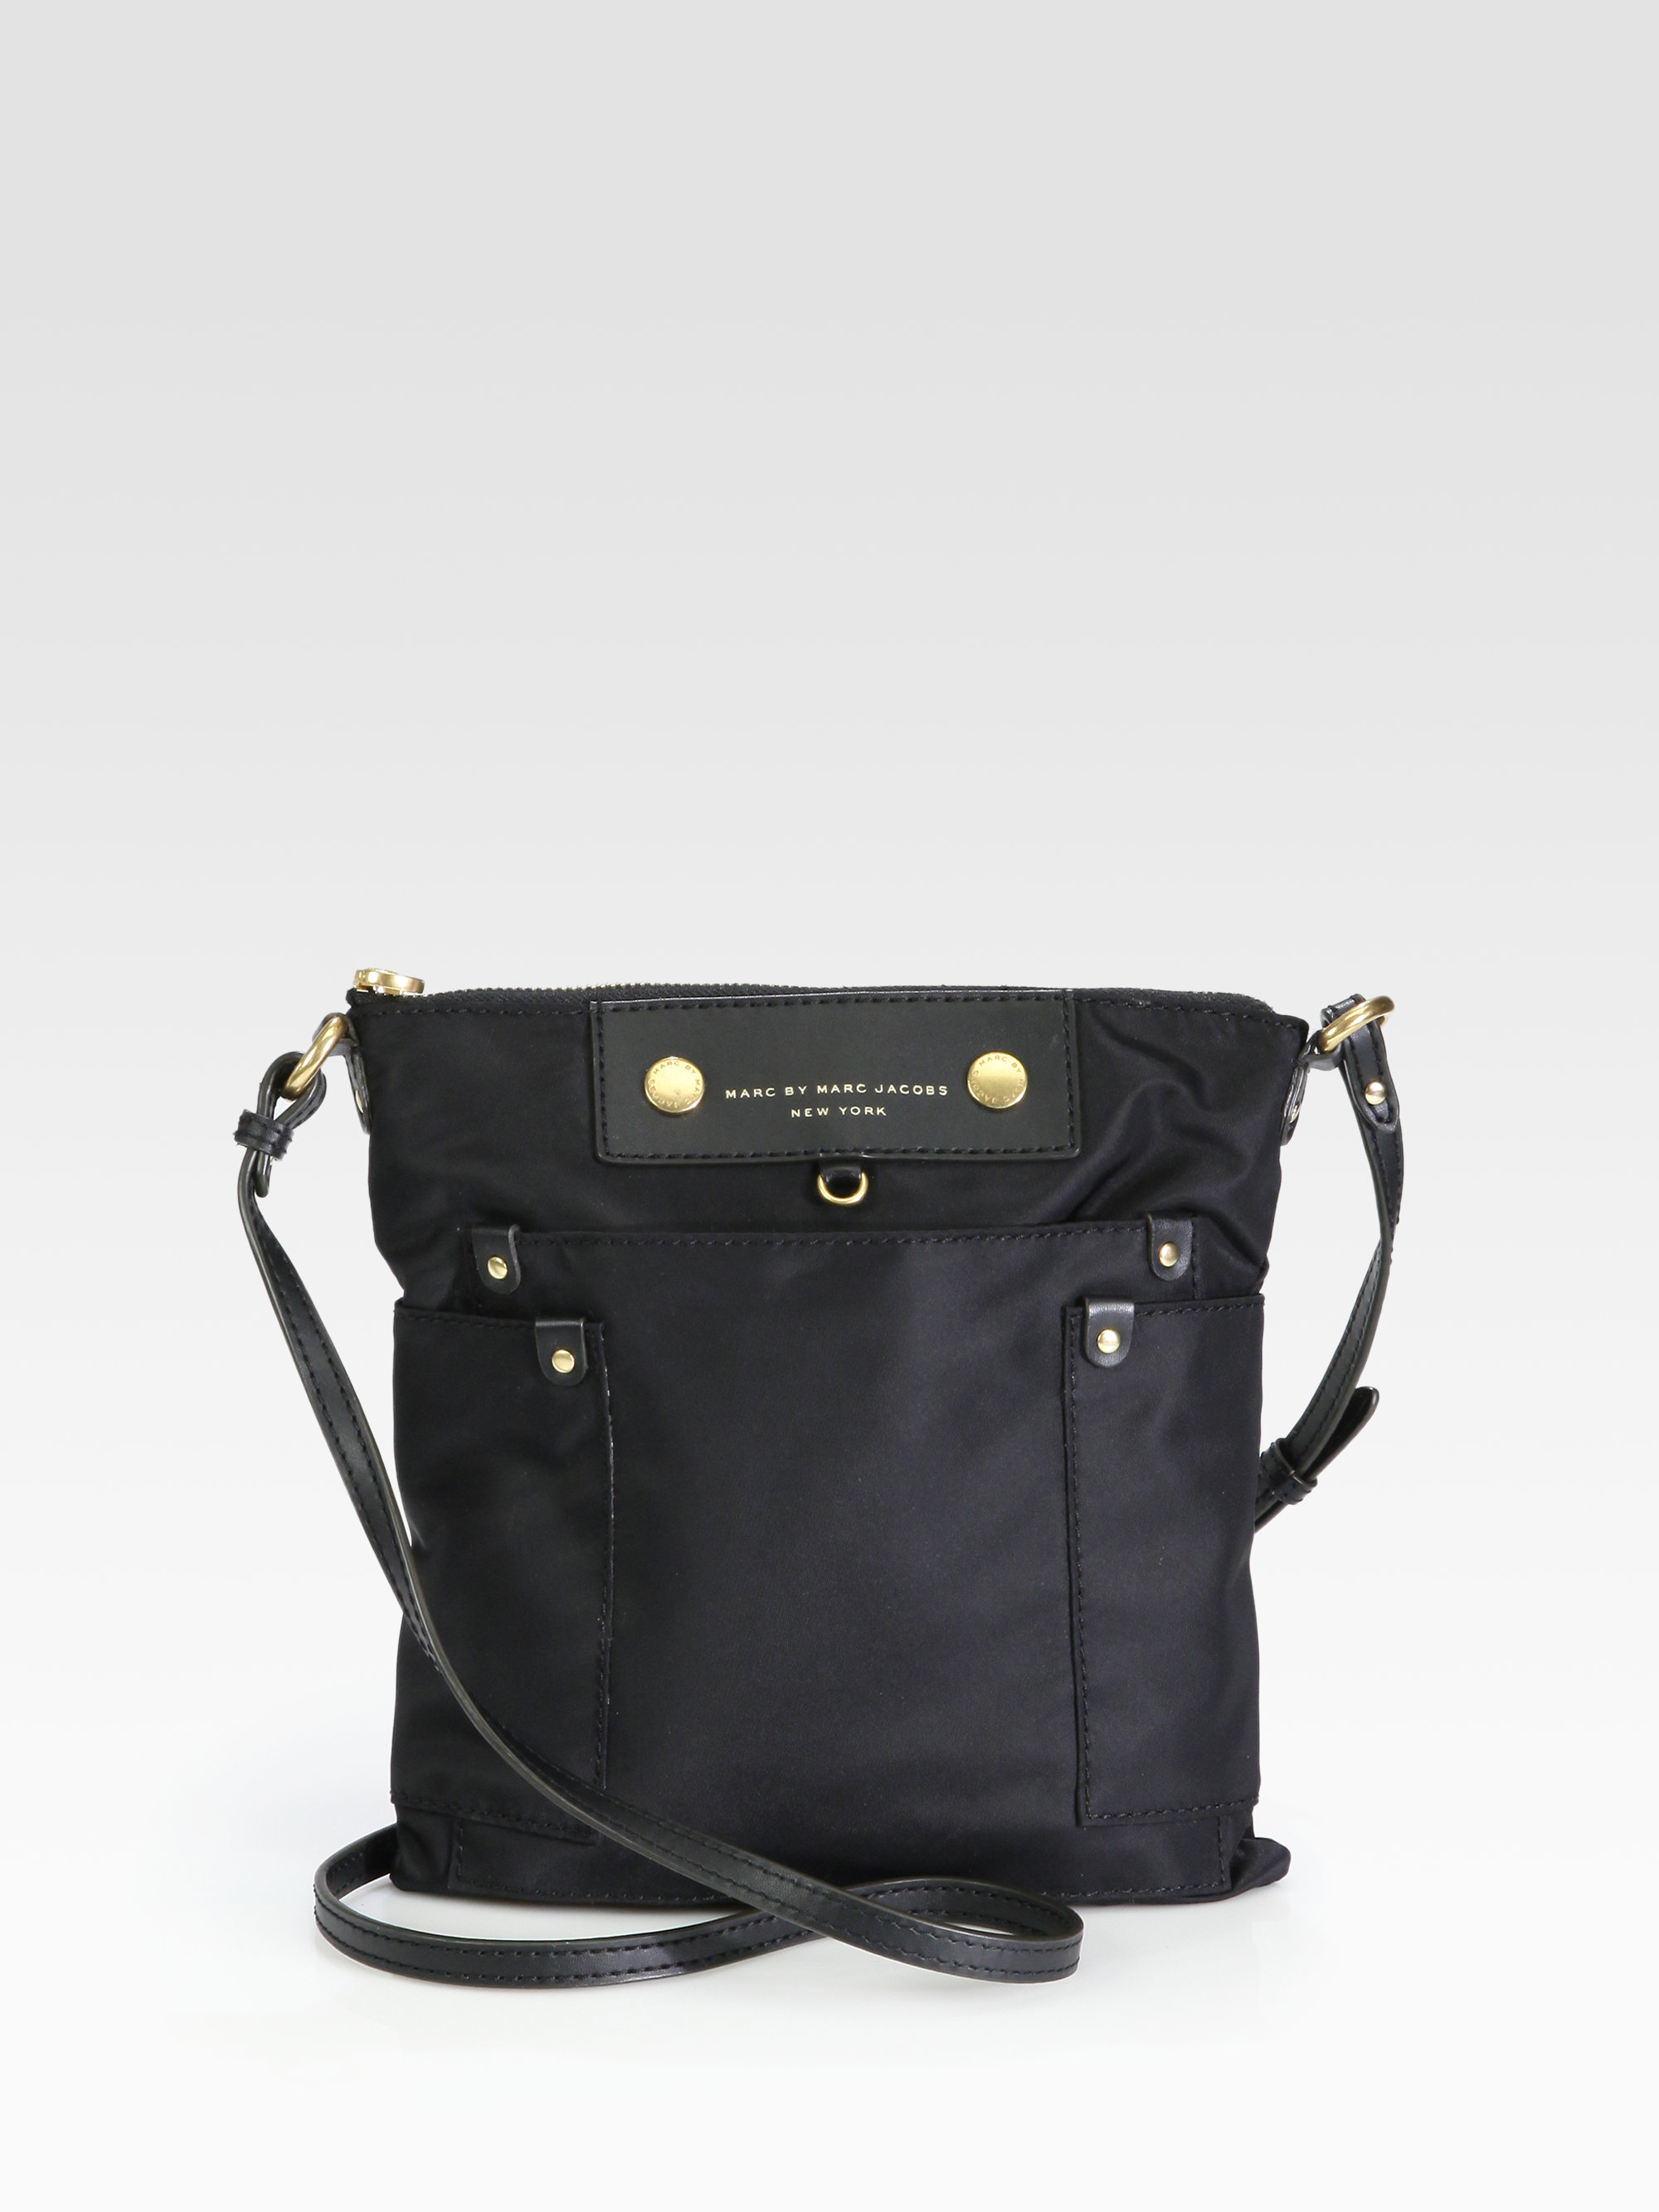 Marc By Marc Jacobs Preppy Nylon Sia Crossbody Bag in Black - Lyst 9dfd565105c5